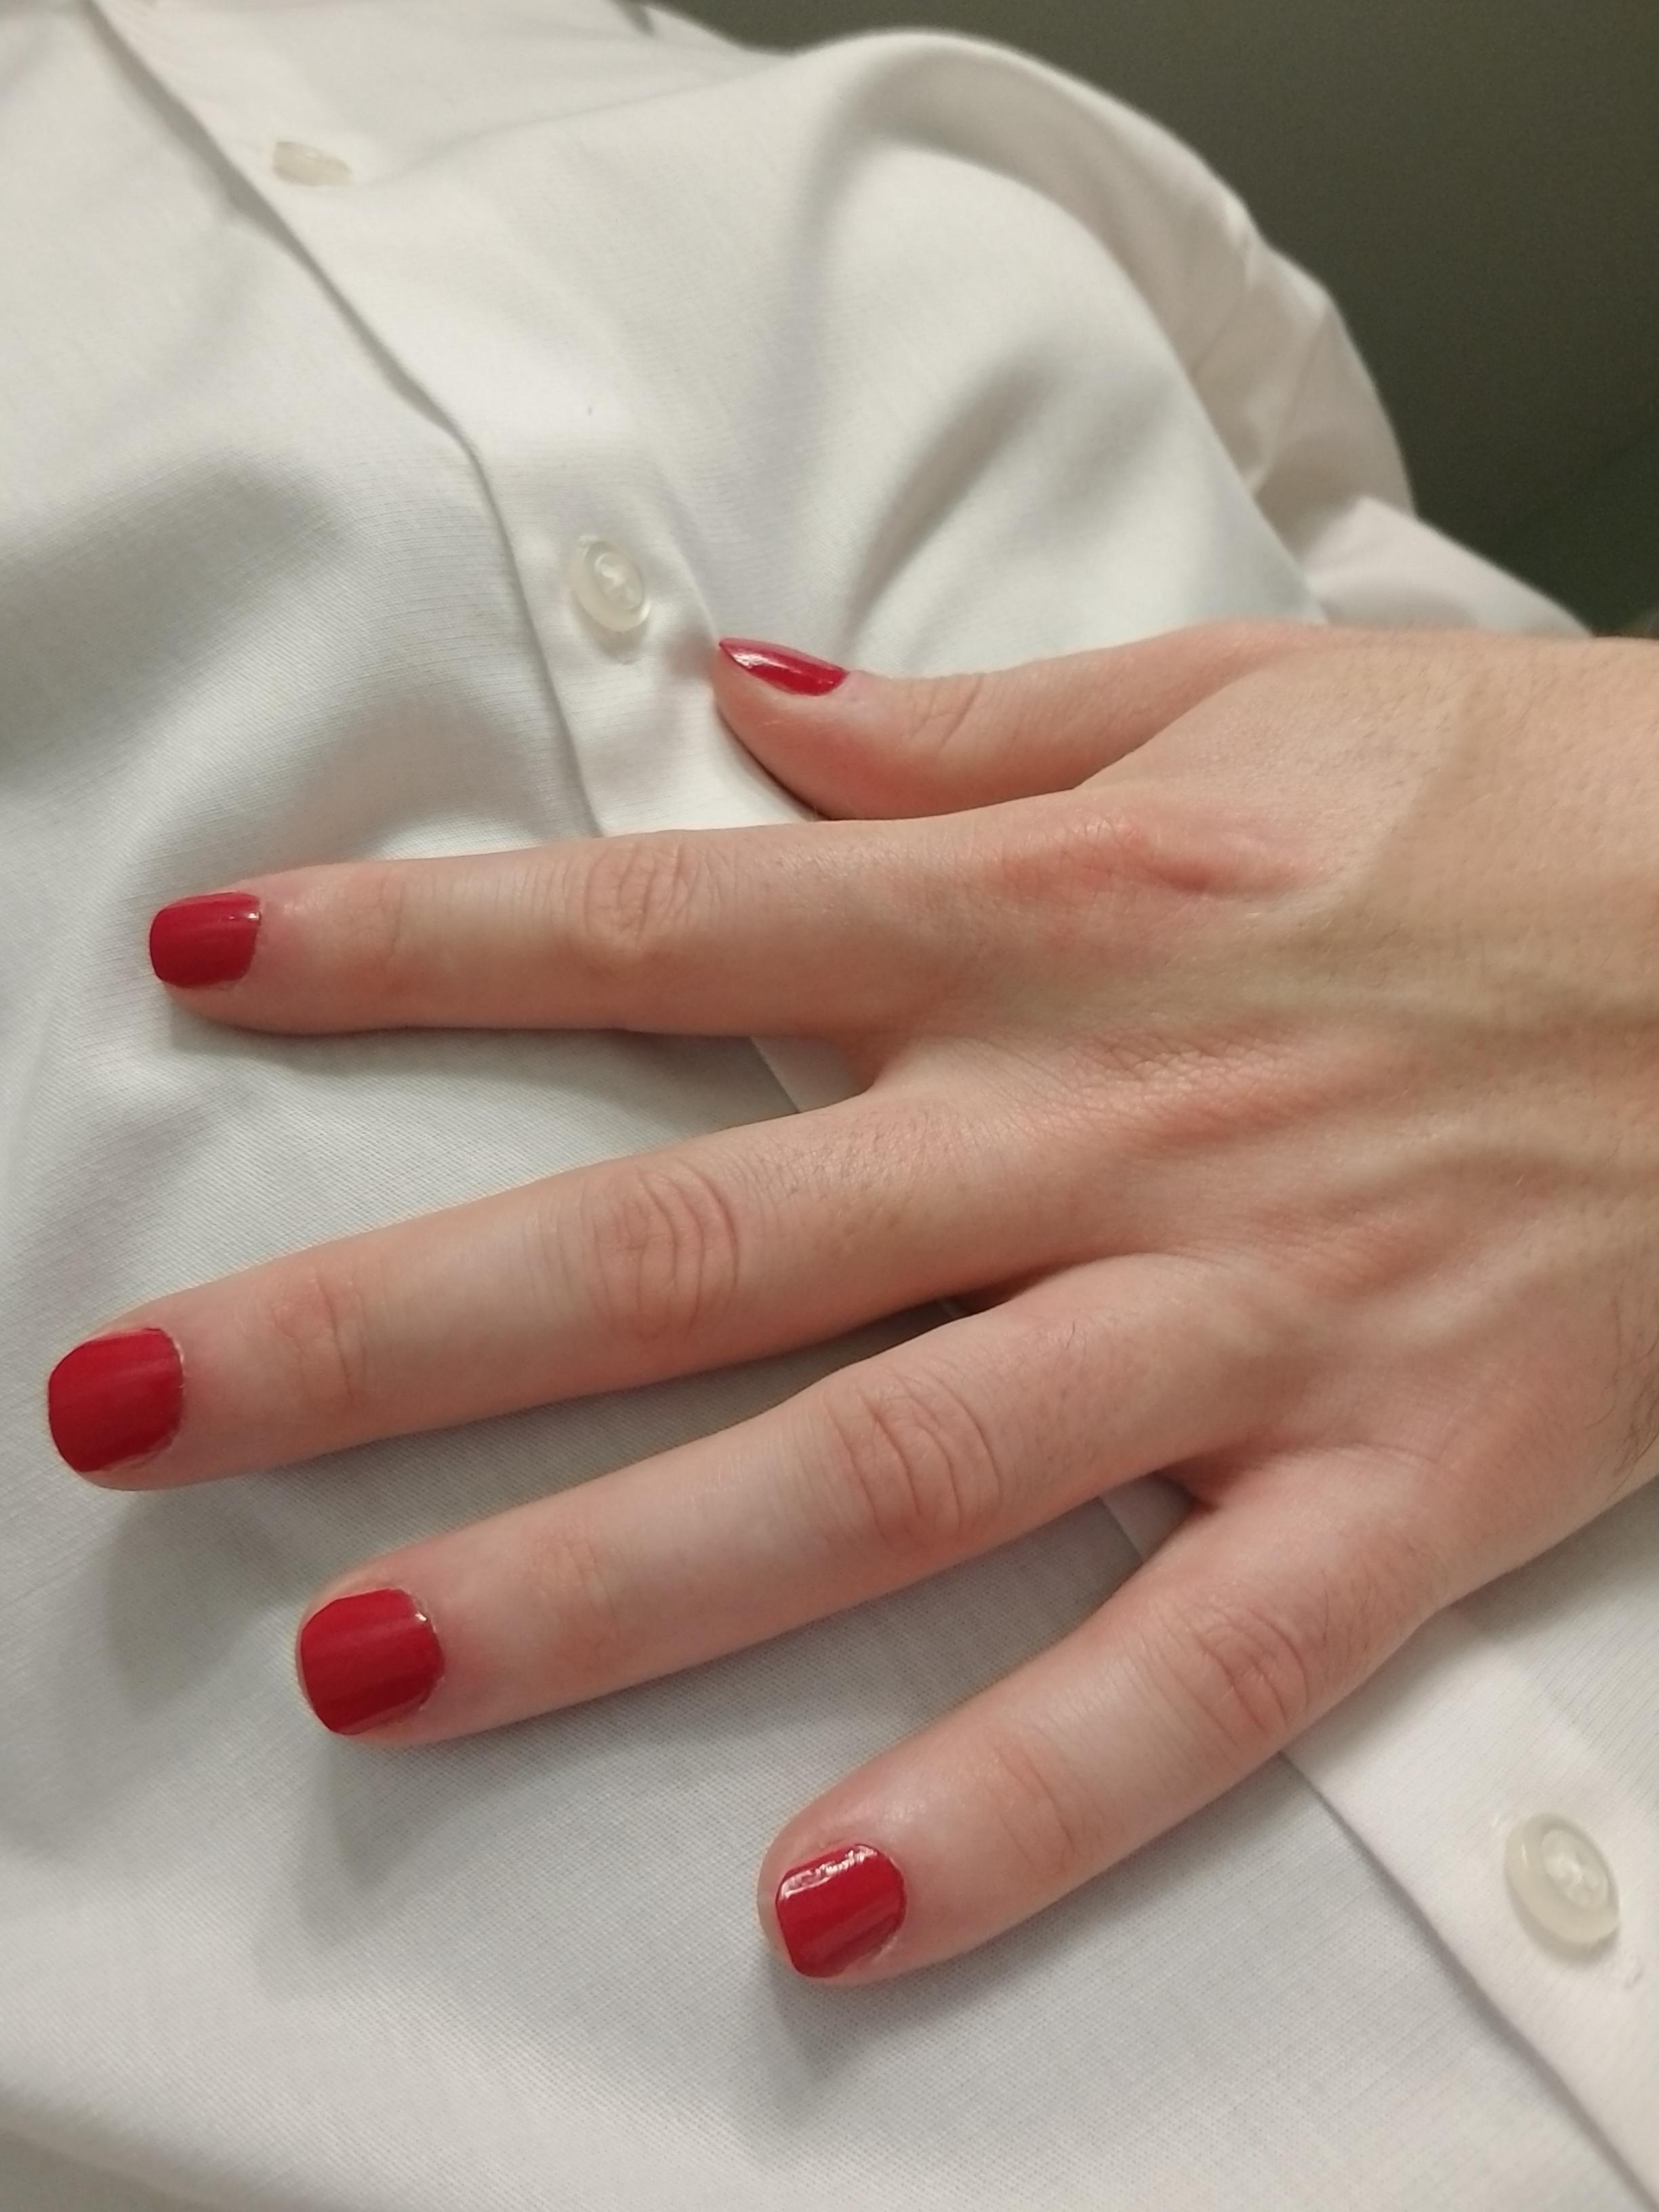 Blood Red Nailpolish : blood, nailpolish, Blood, Nails,, White, Shirt., Major, Contrast., Malepolish